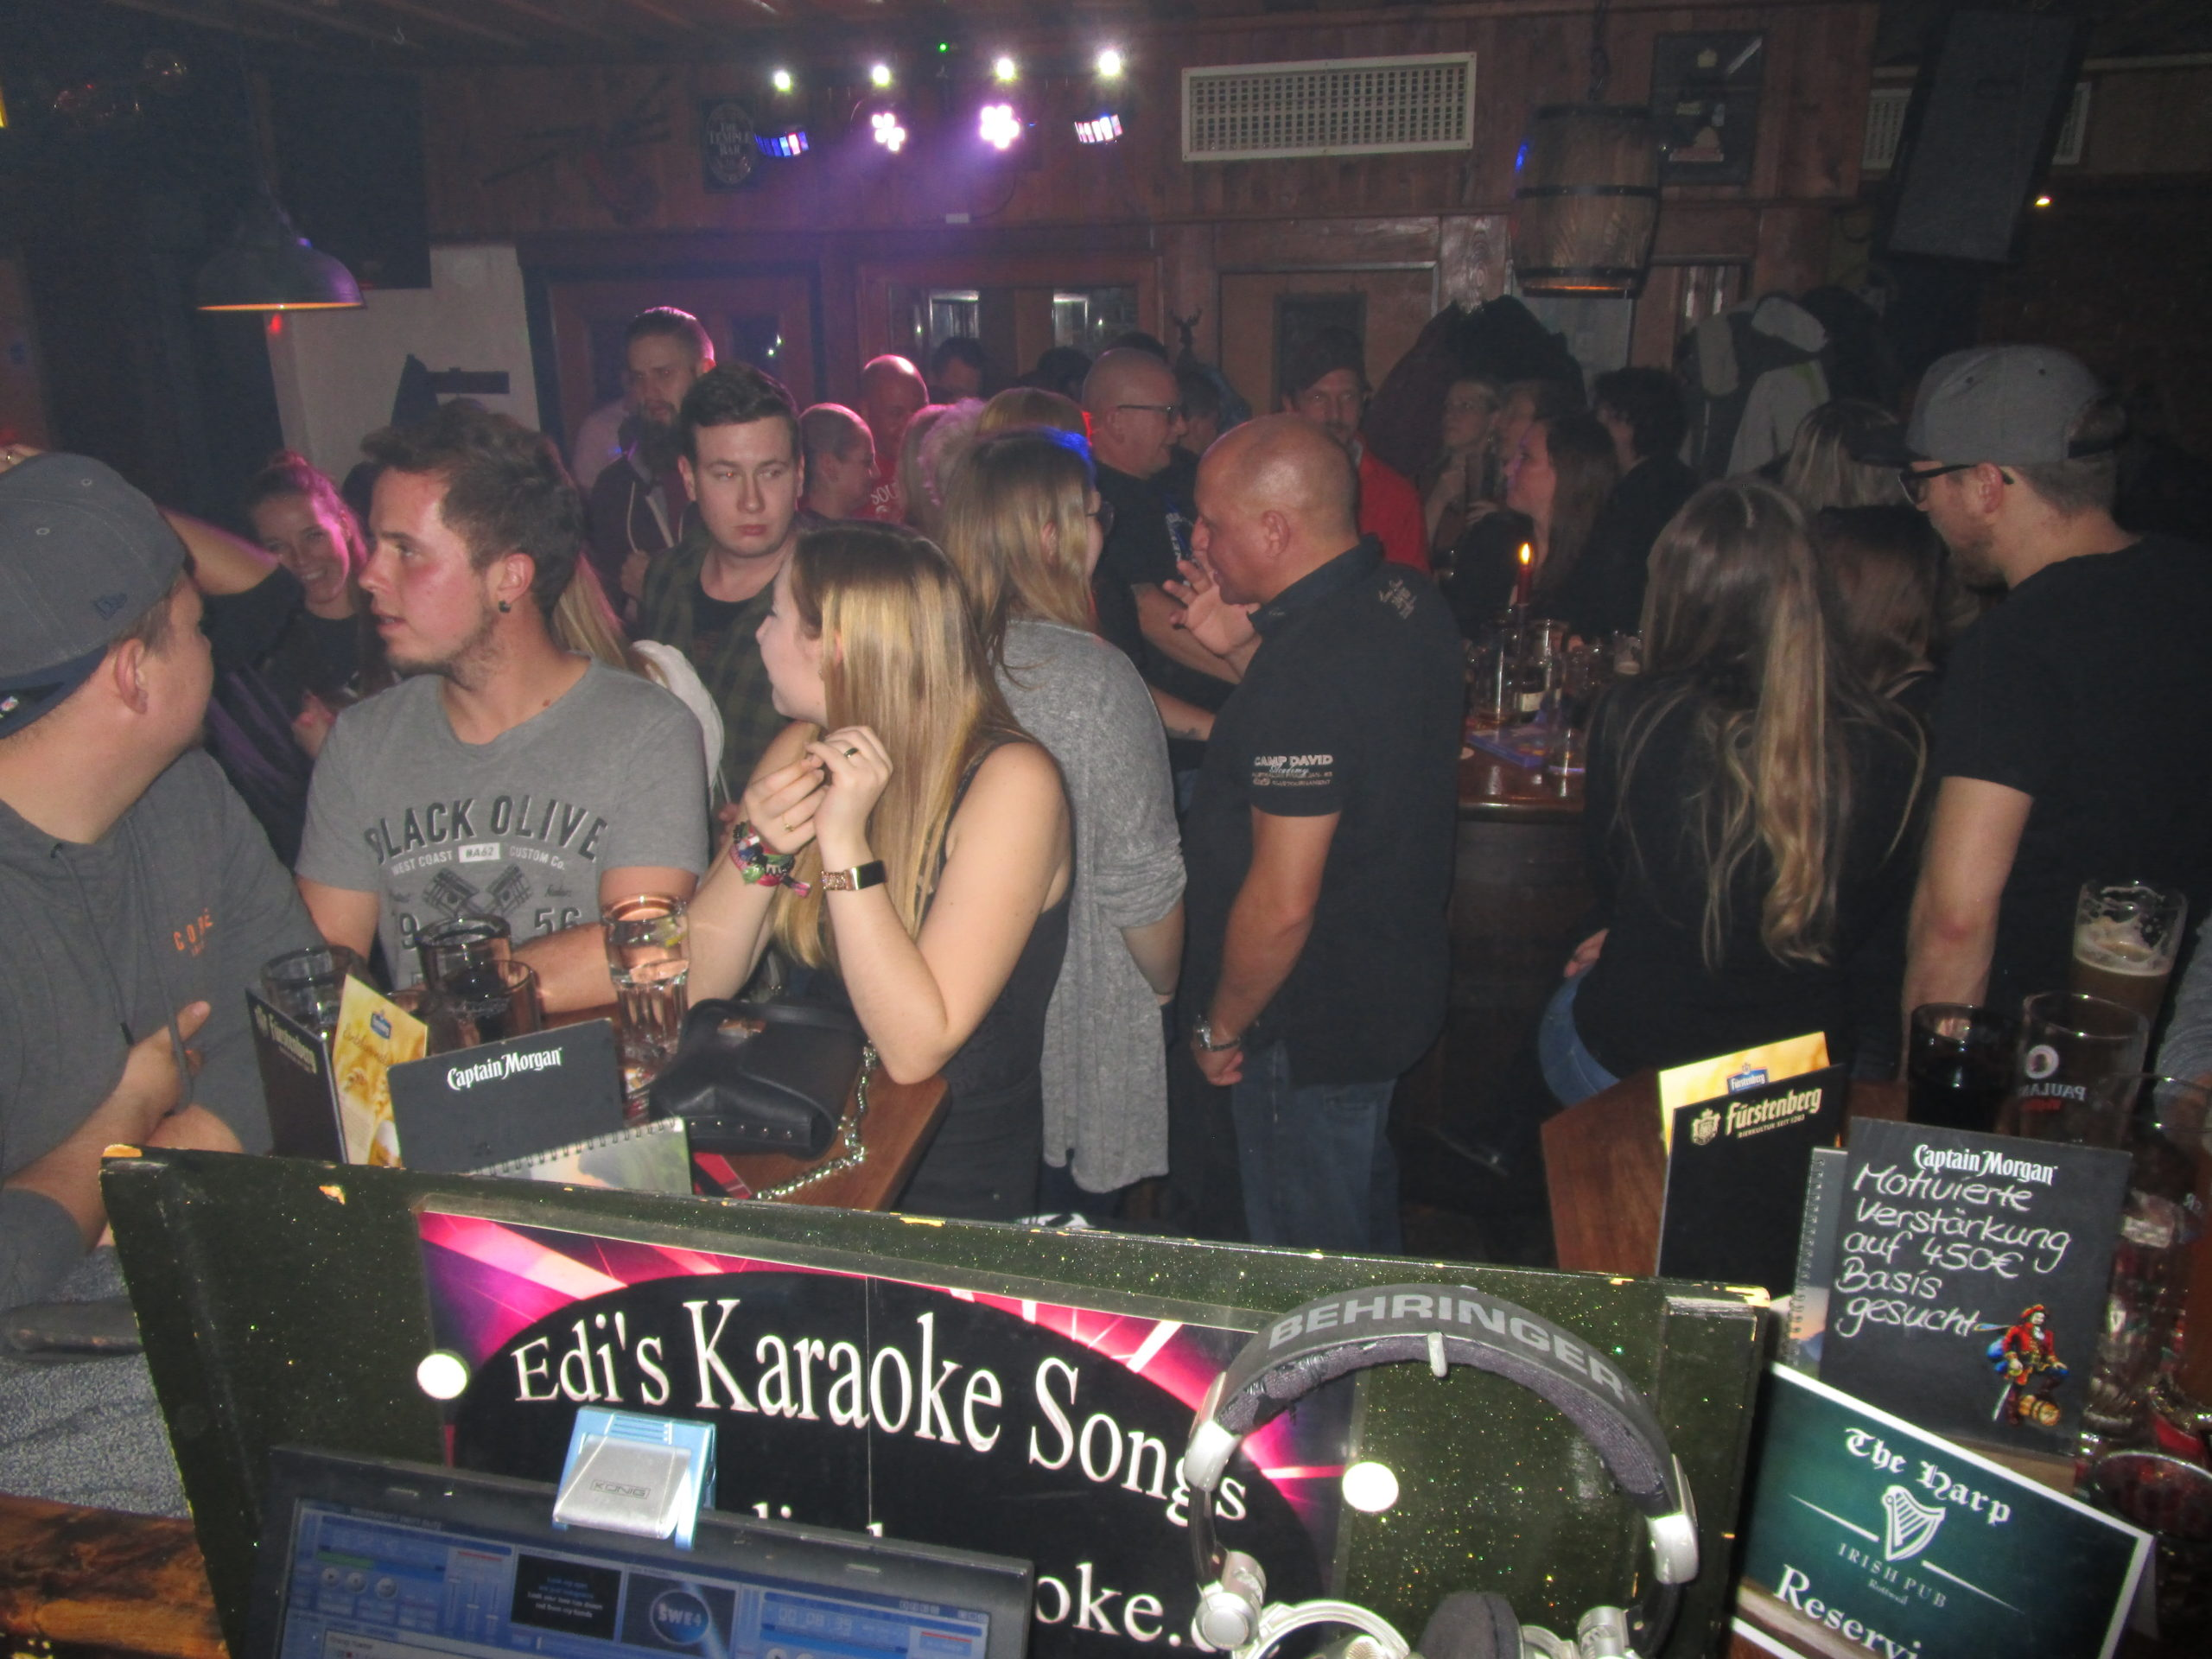 The Harp / Irish Pub, Rottweil, 15.11.2019 - Edis Karaoke